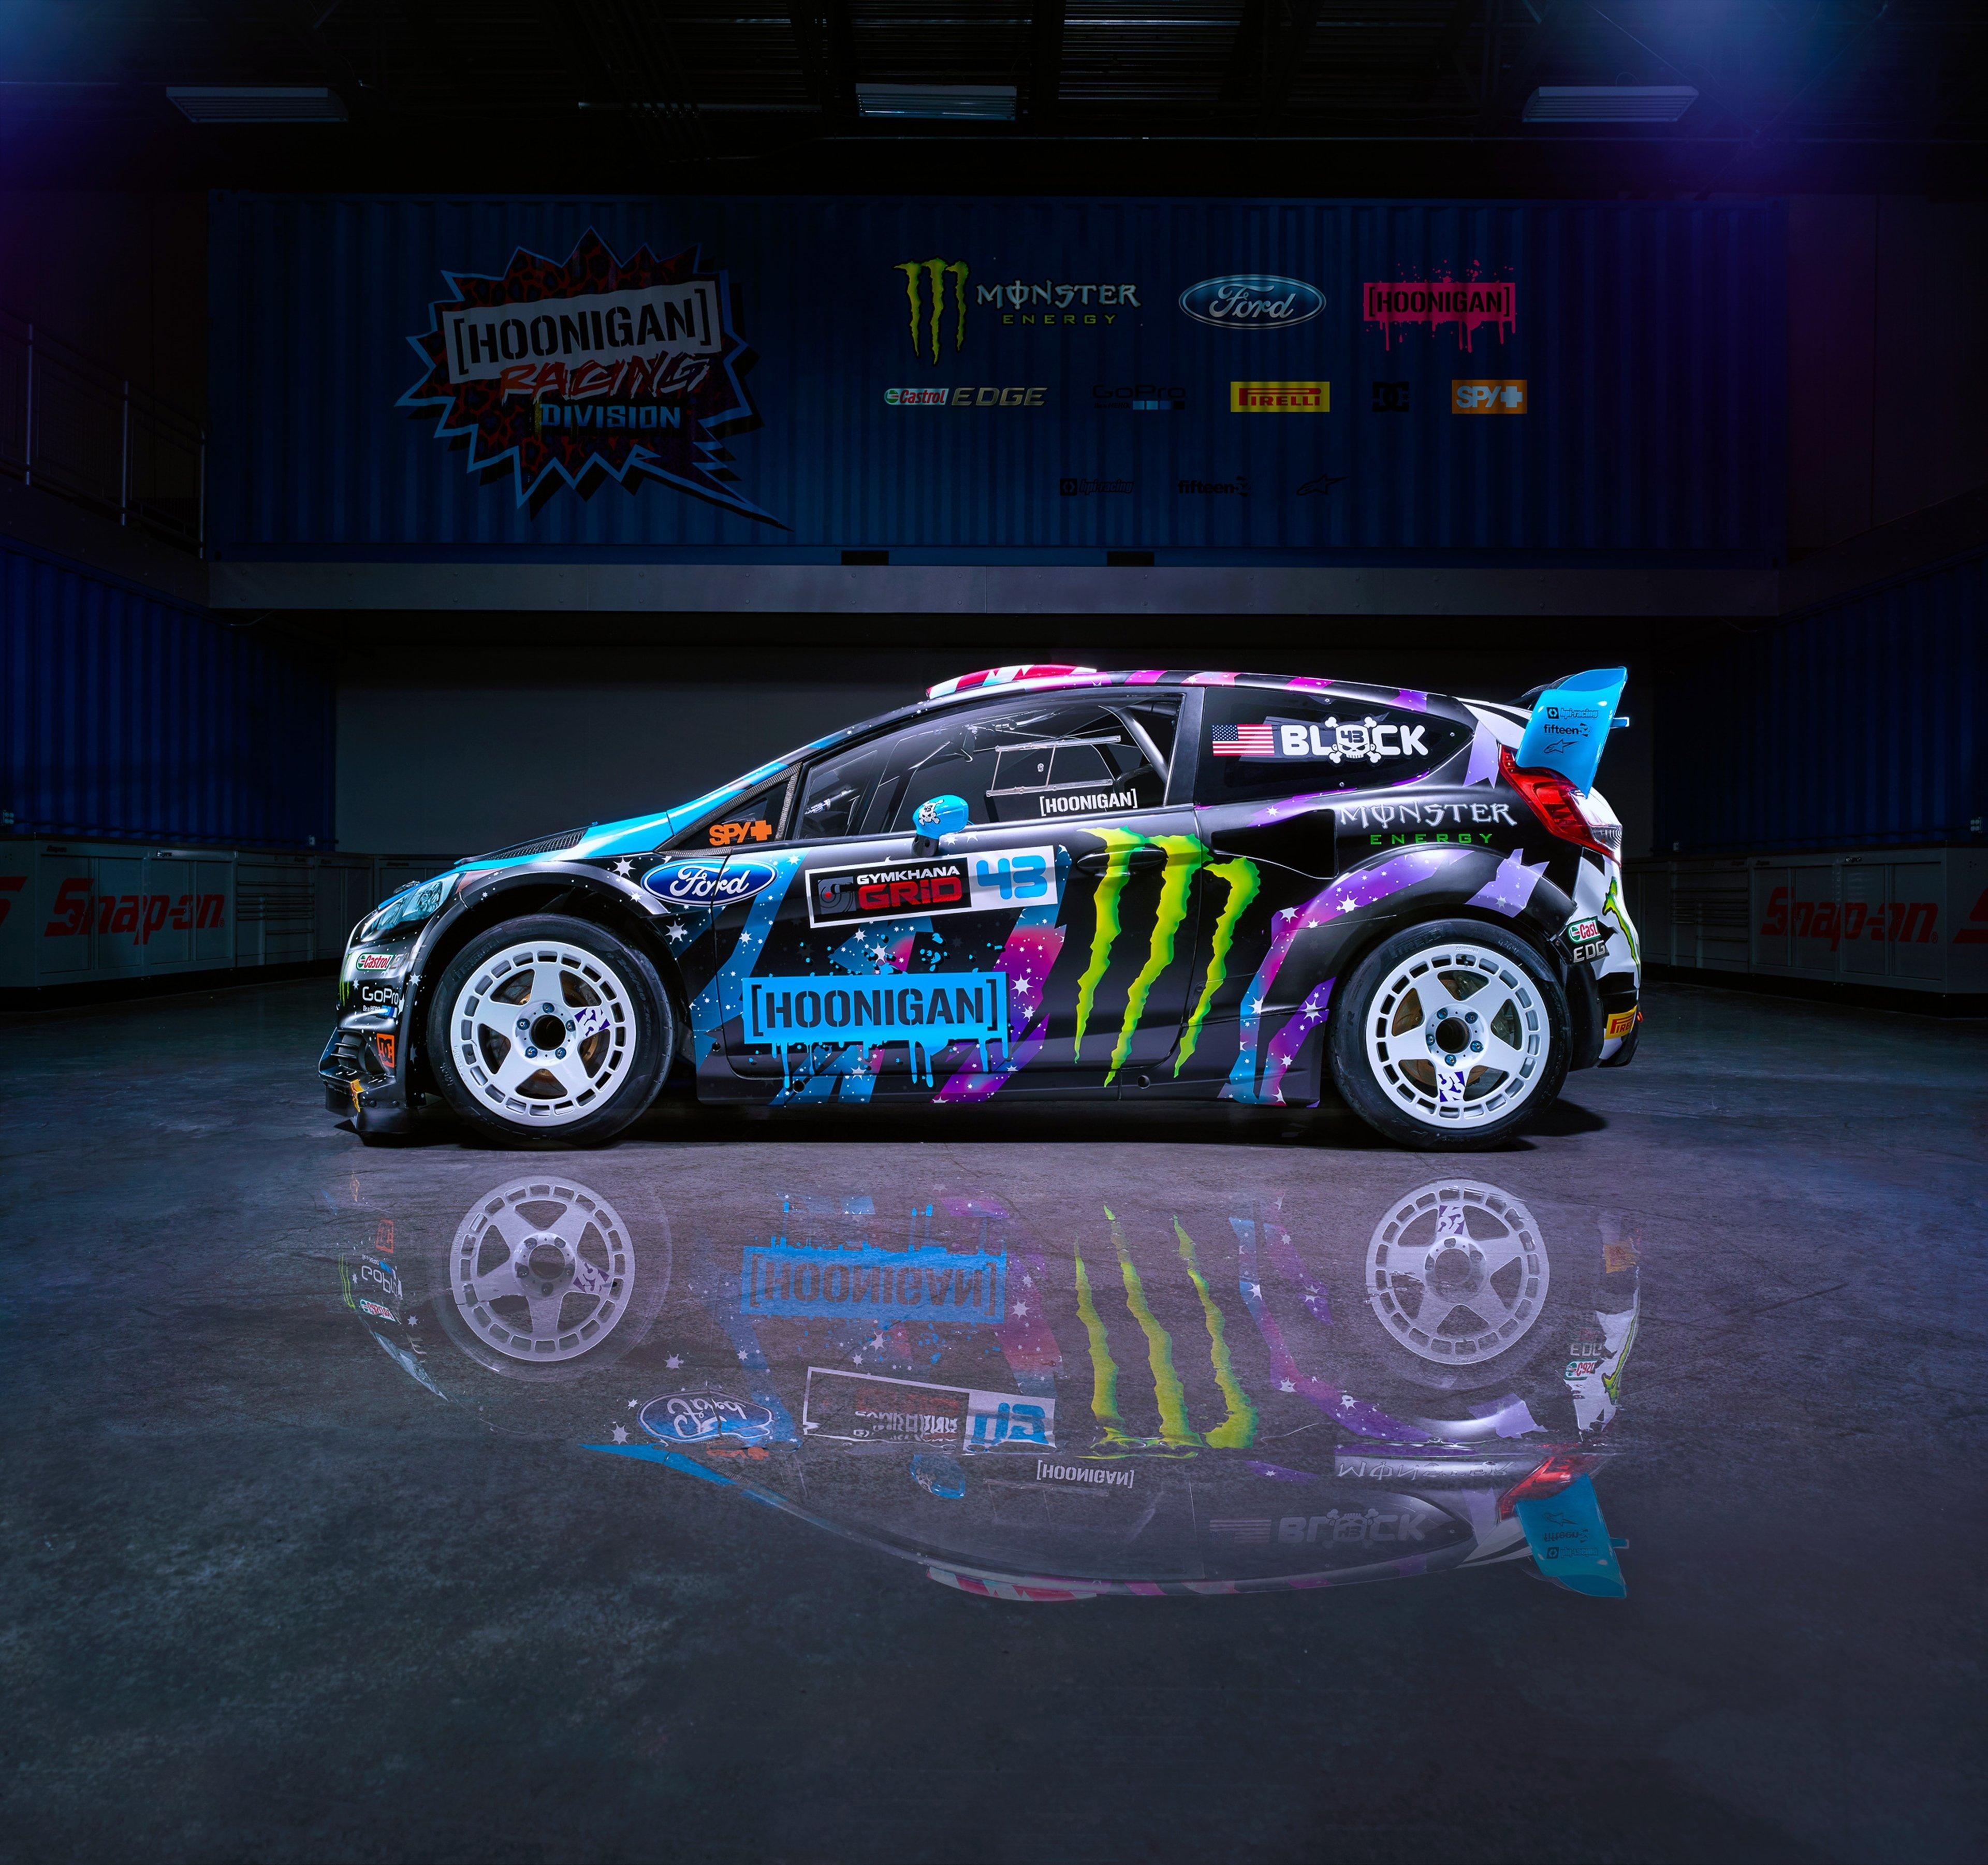 Ford Car Wallpaper: Ford Fiesta RX43 2015 Ken Block Hoonigan Racing Division